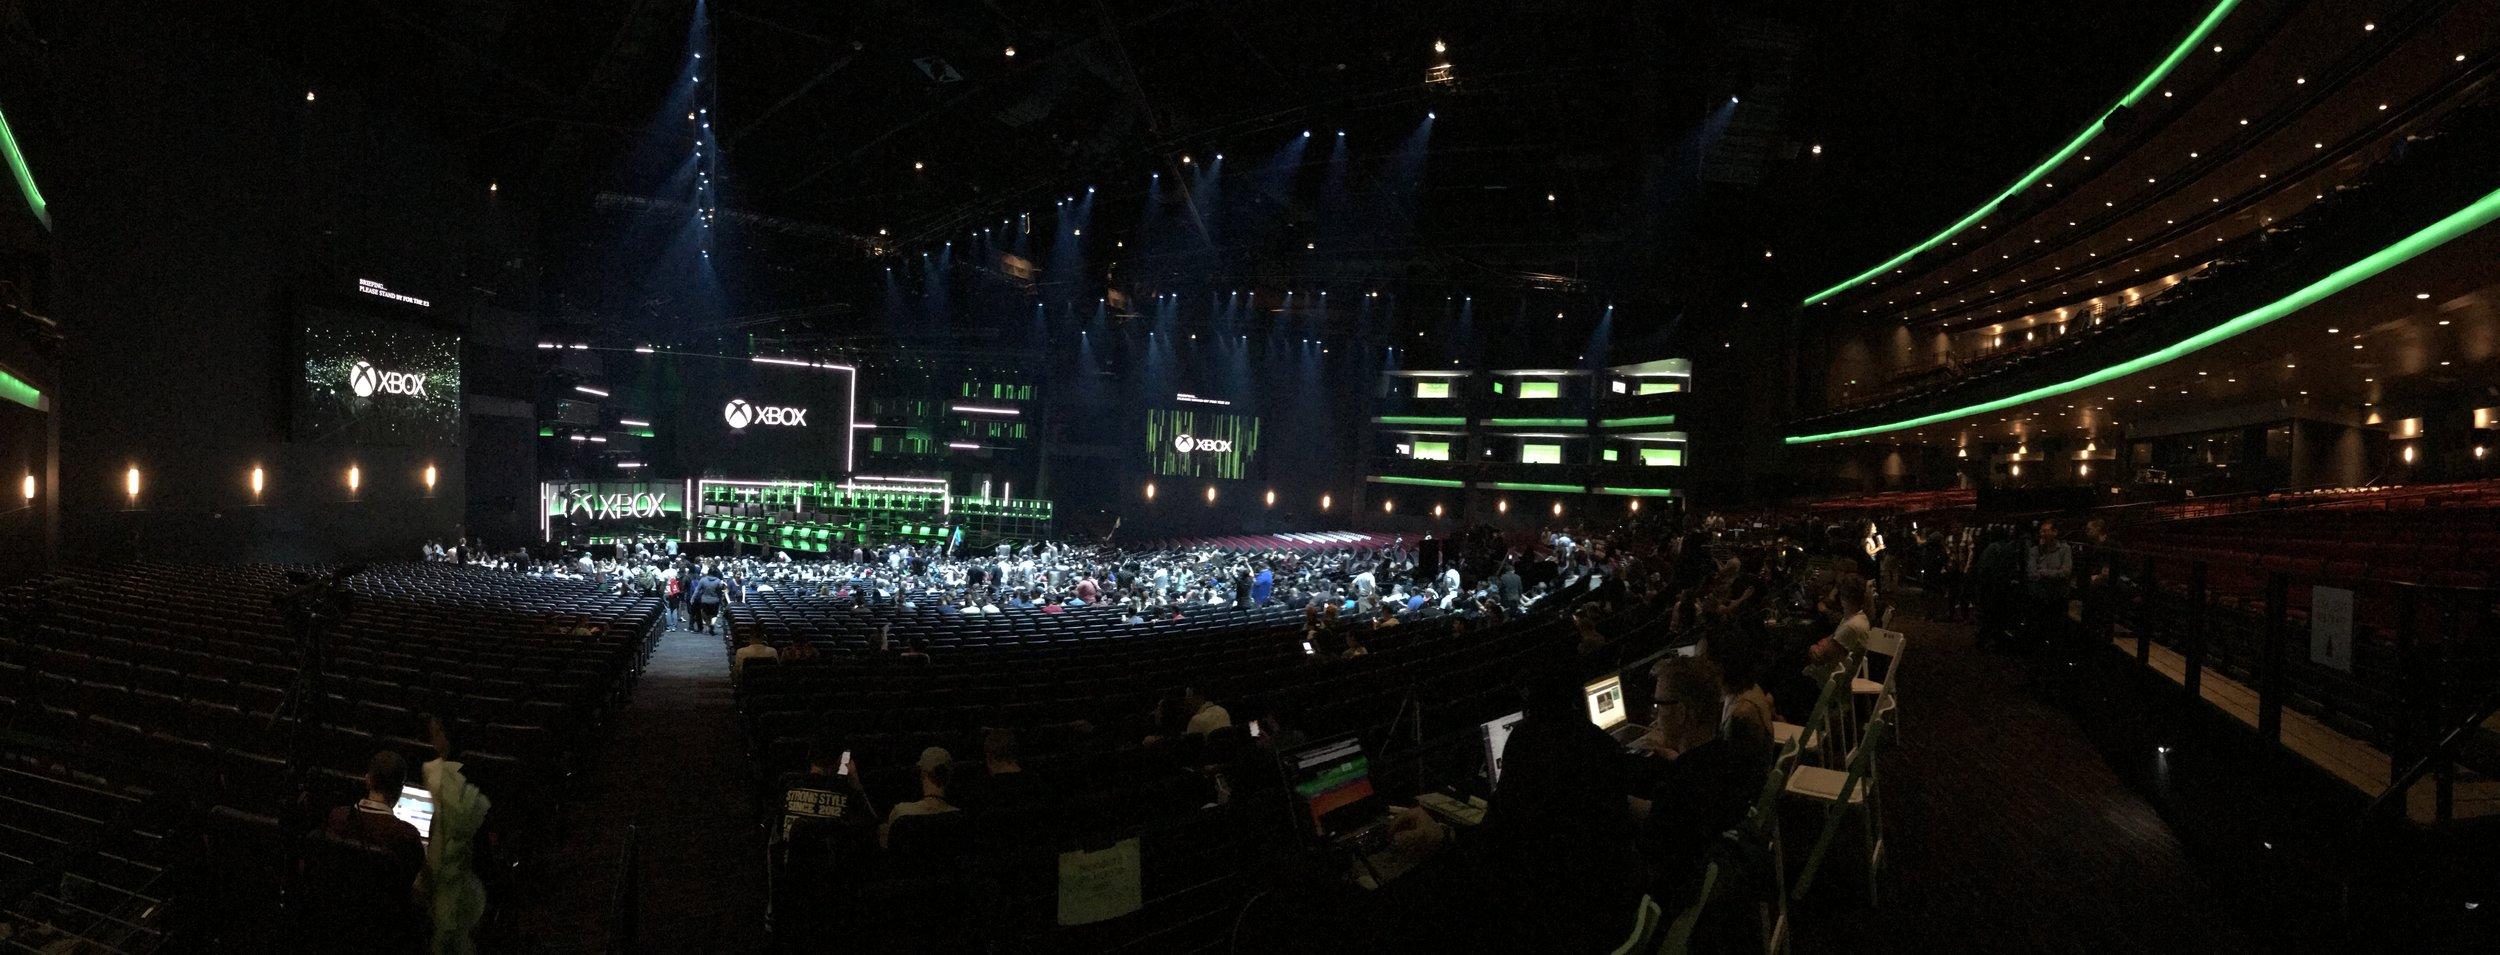 XBOX PANORAMA E3 2018